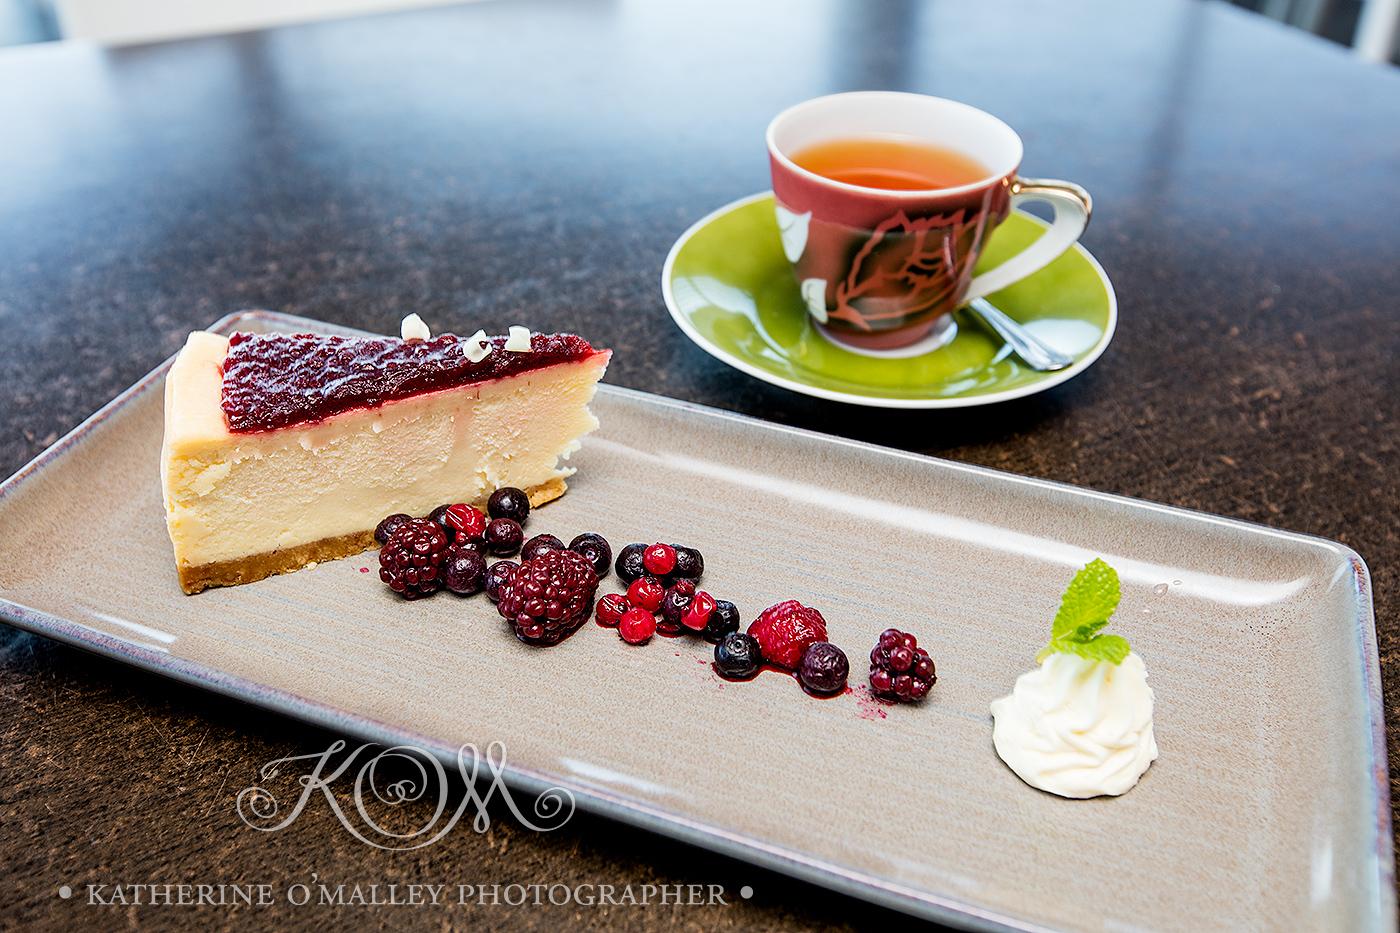 Mixed Berry Cheesecake and Tea. Arana Leagues Club © katherine o'malley, 2016